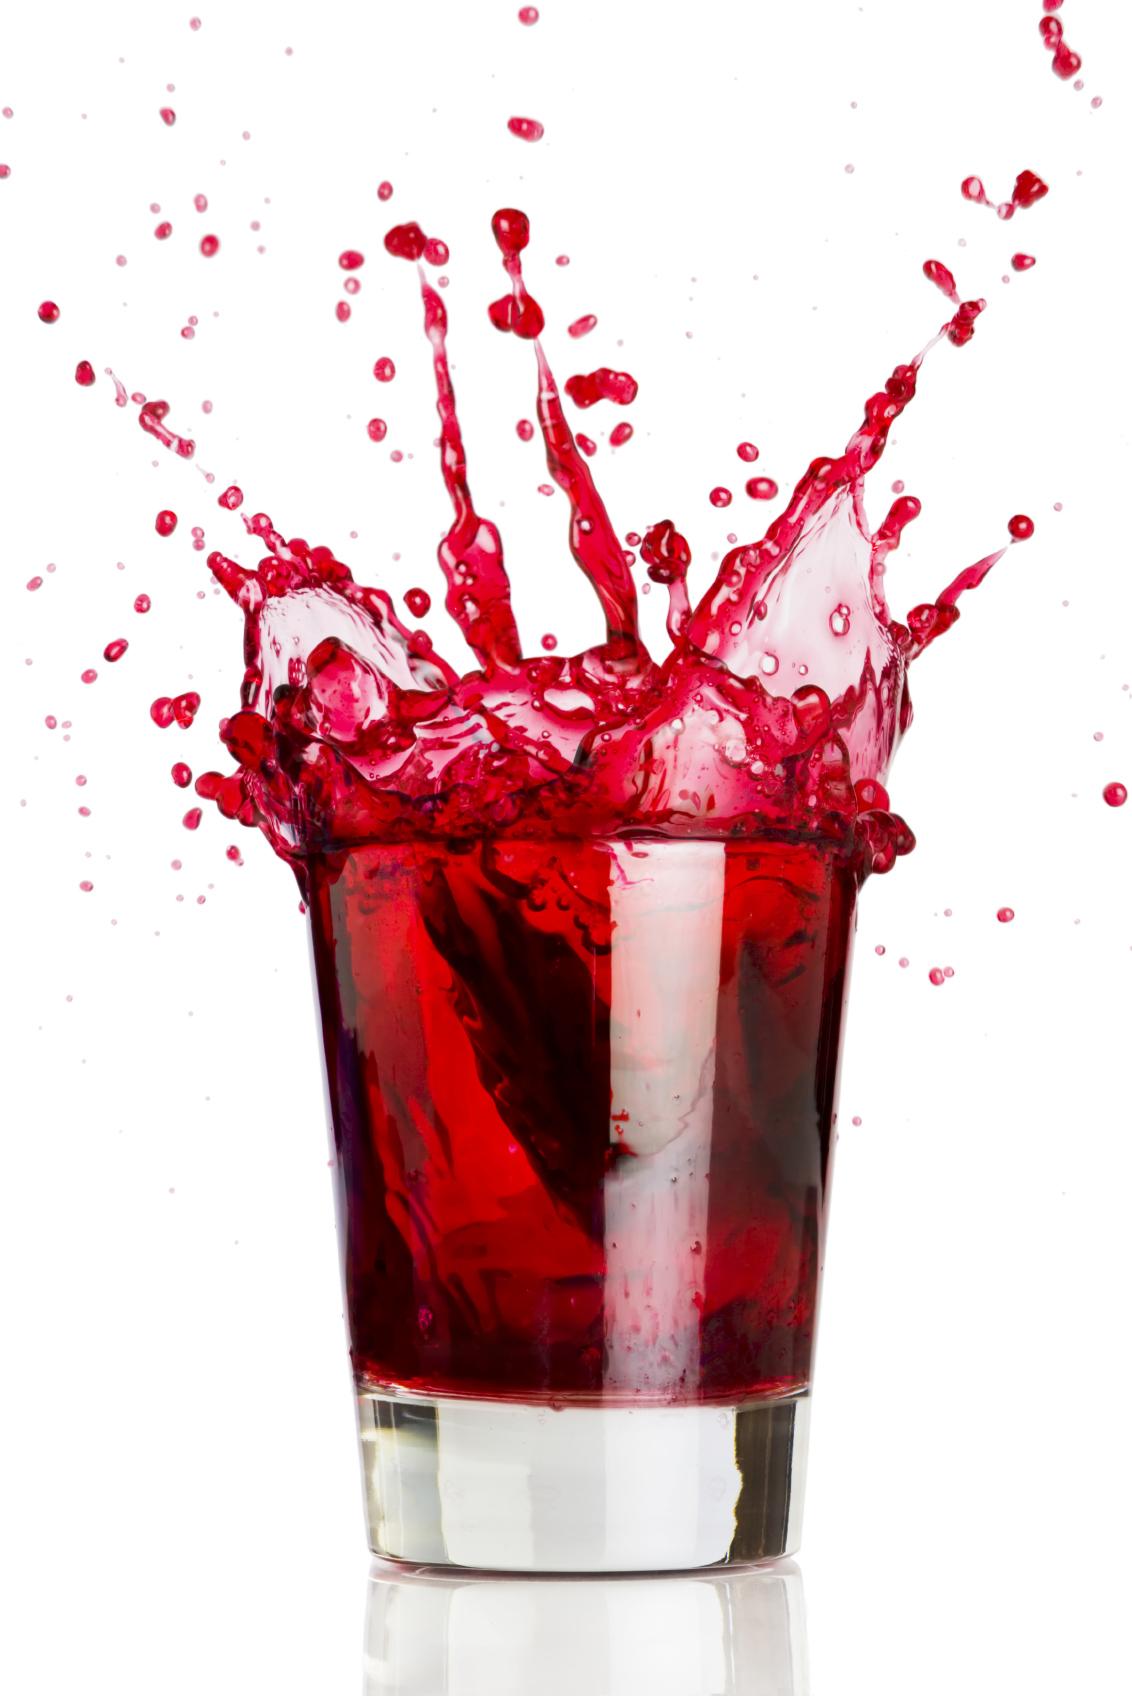 Blood Shot Drink Of The Week